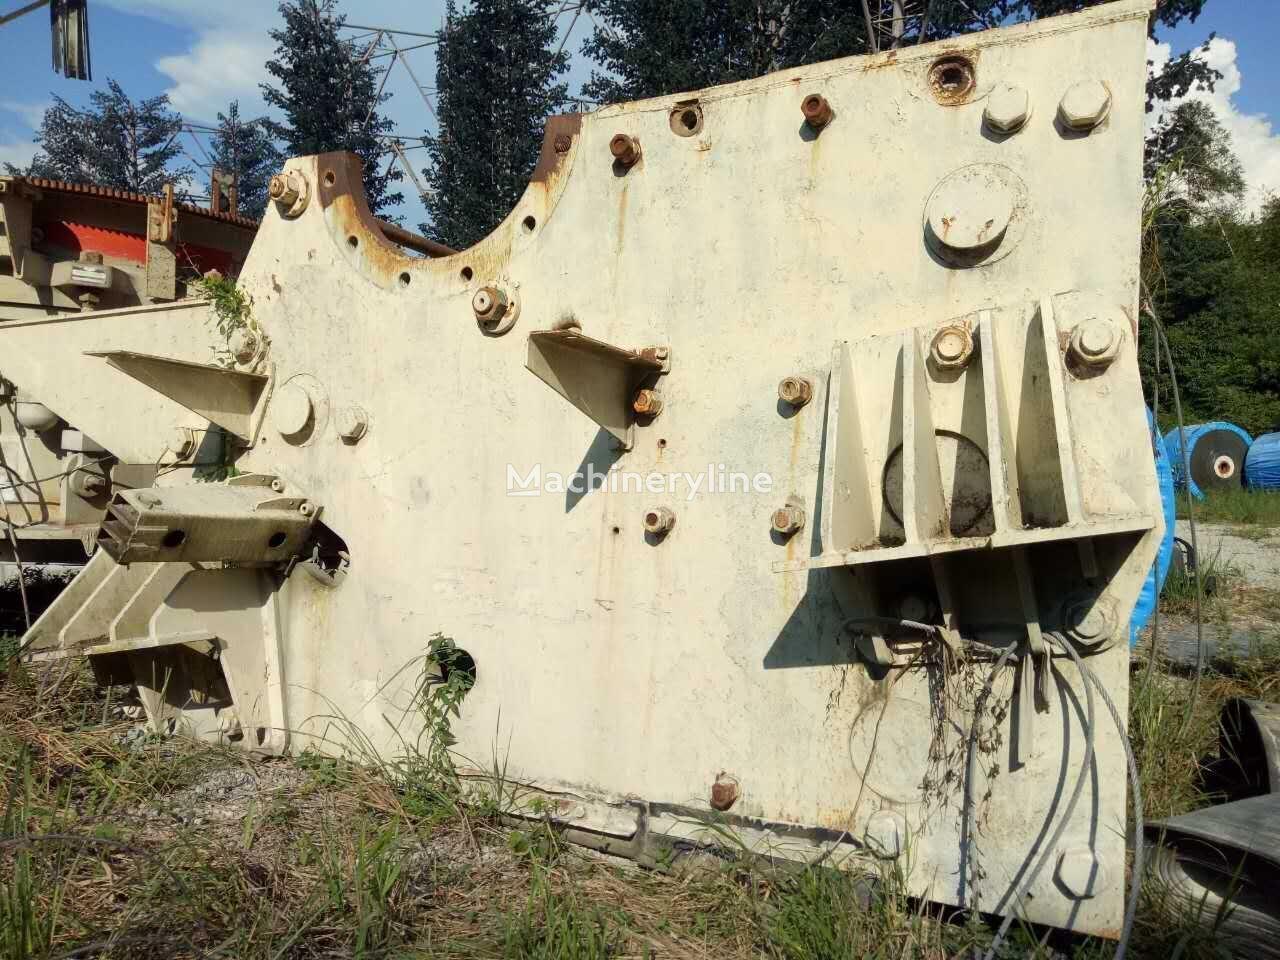 NORDBERG taş kırma makinesi